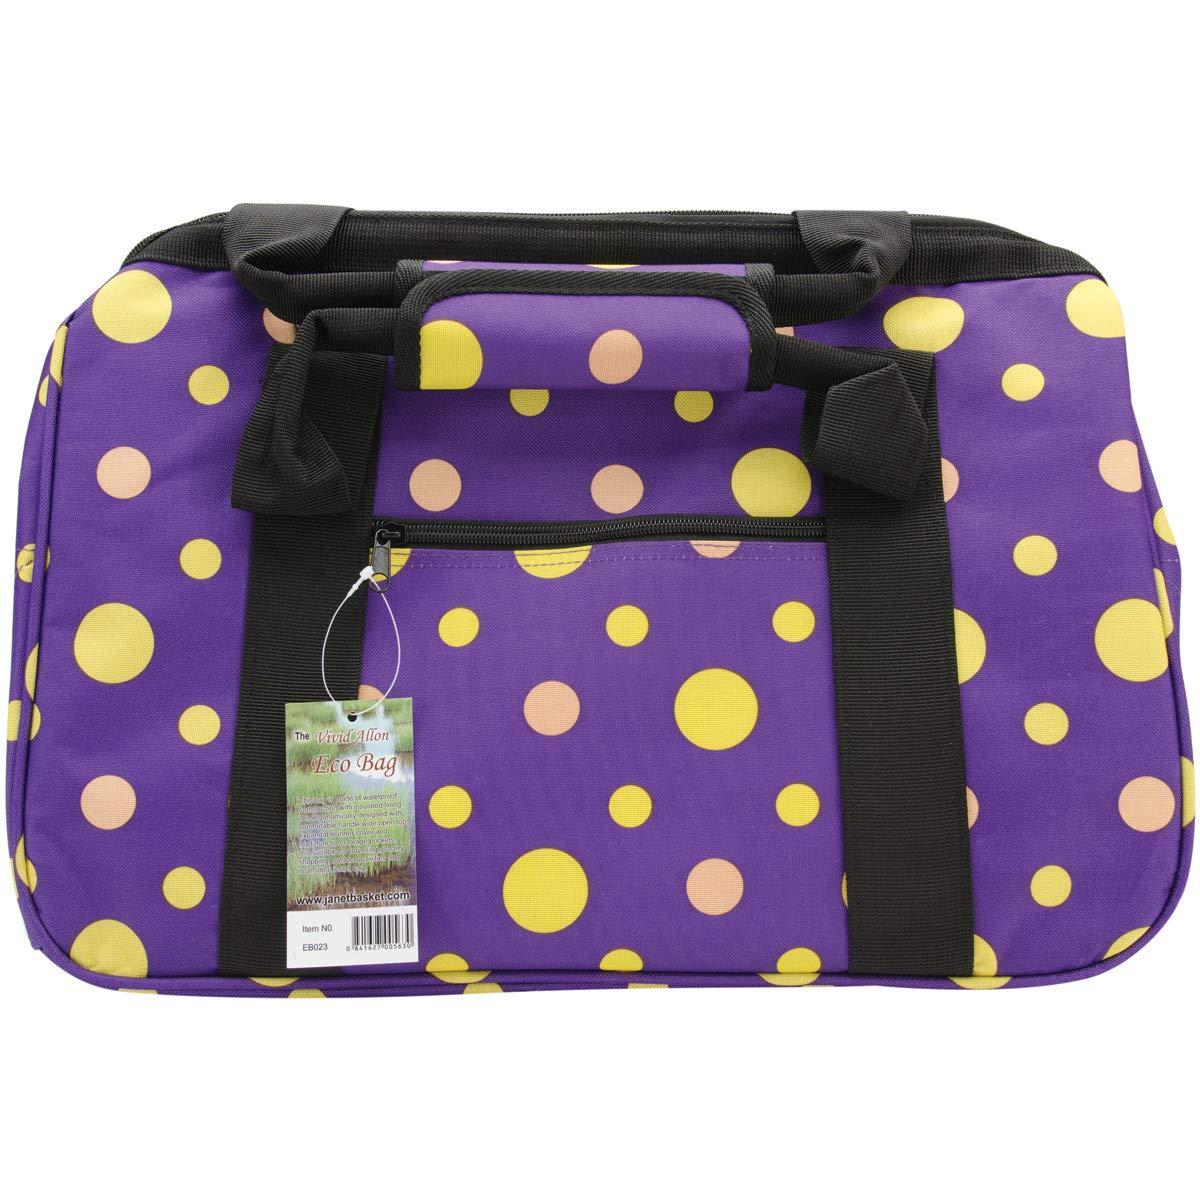 JanetBasket Eco Bag-18 inch x 10 inch x 12 inch Twilight EB023